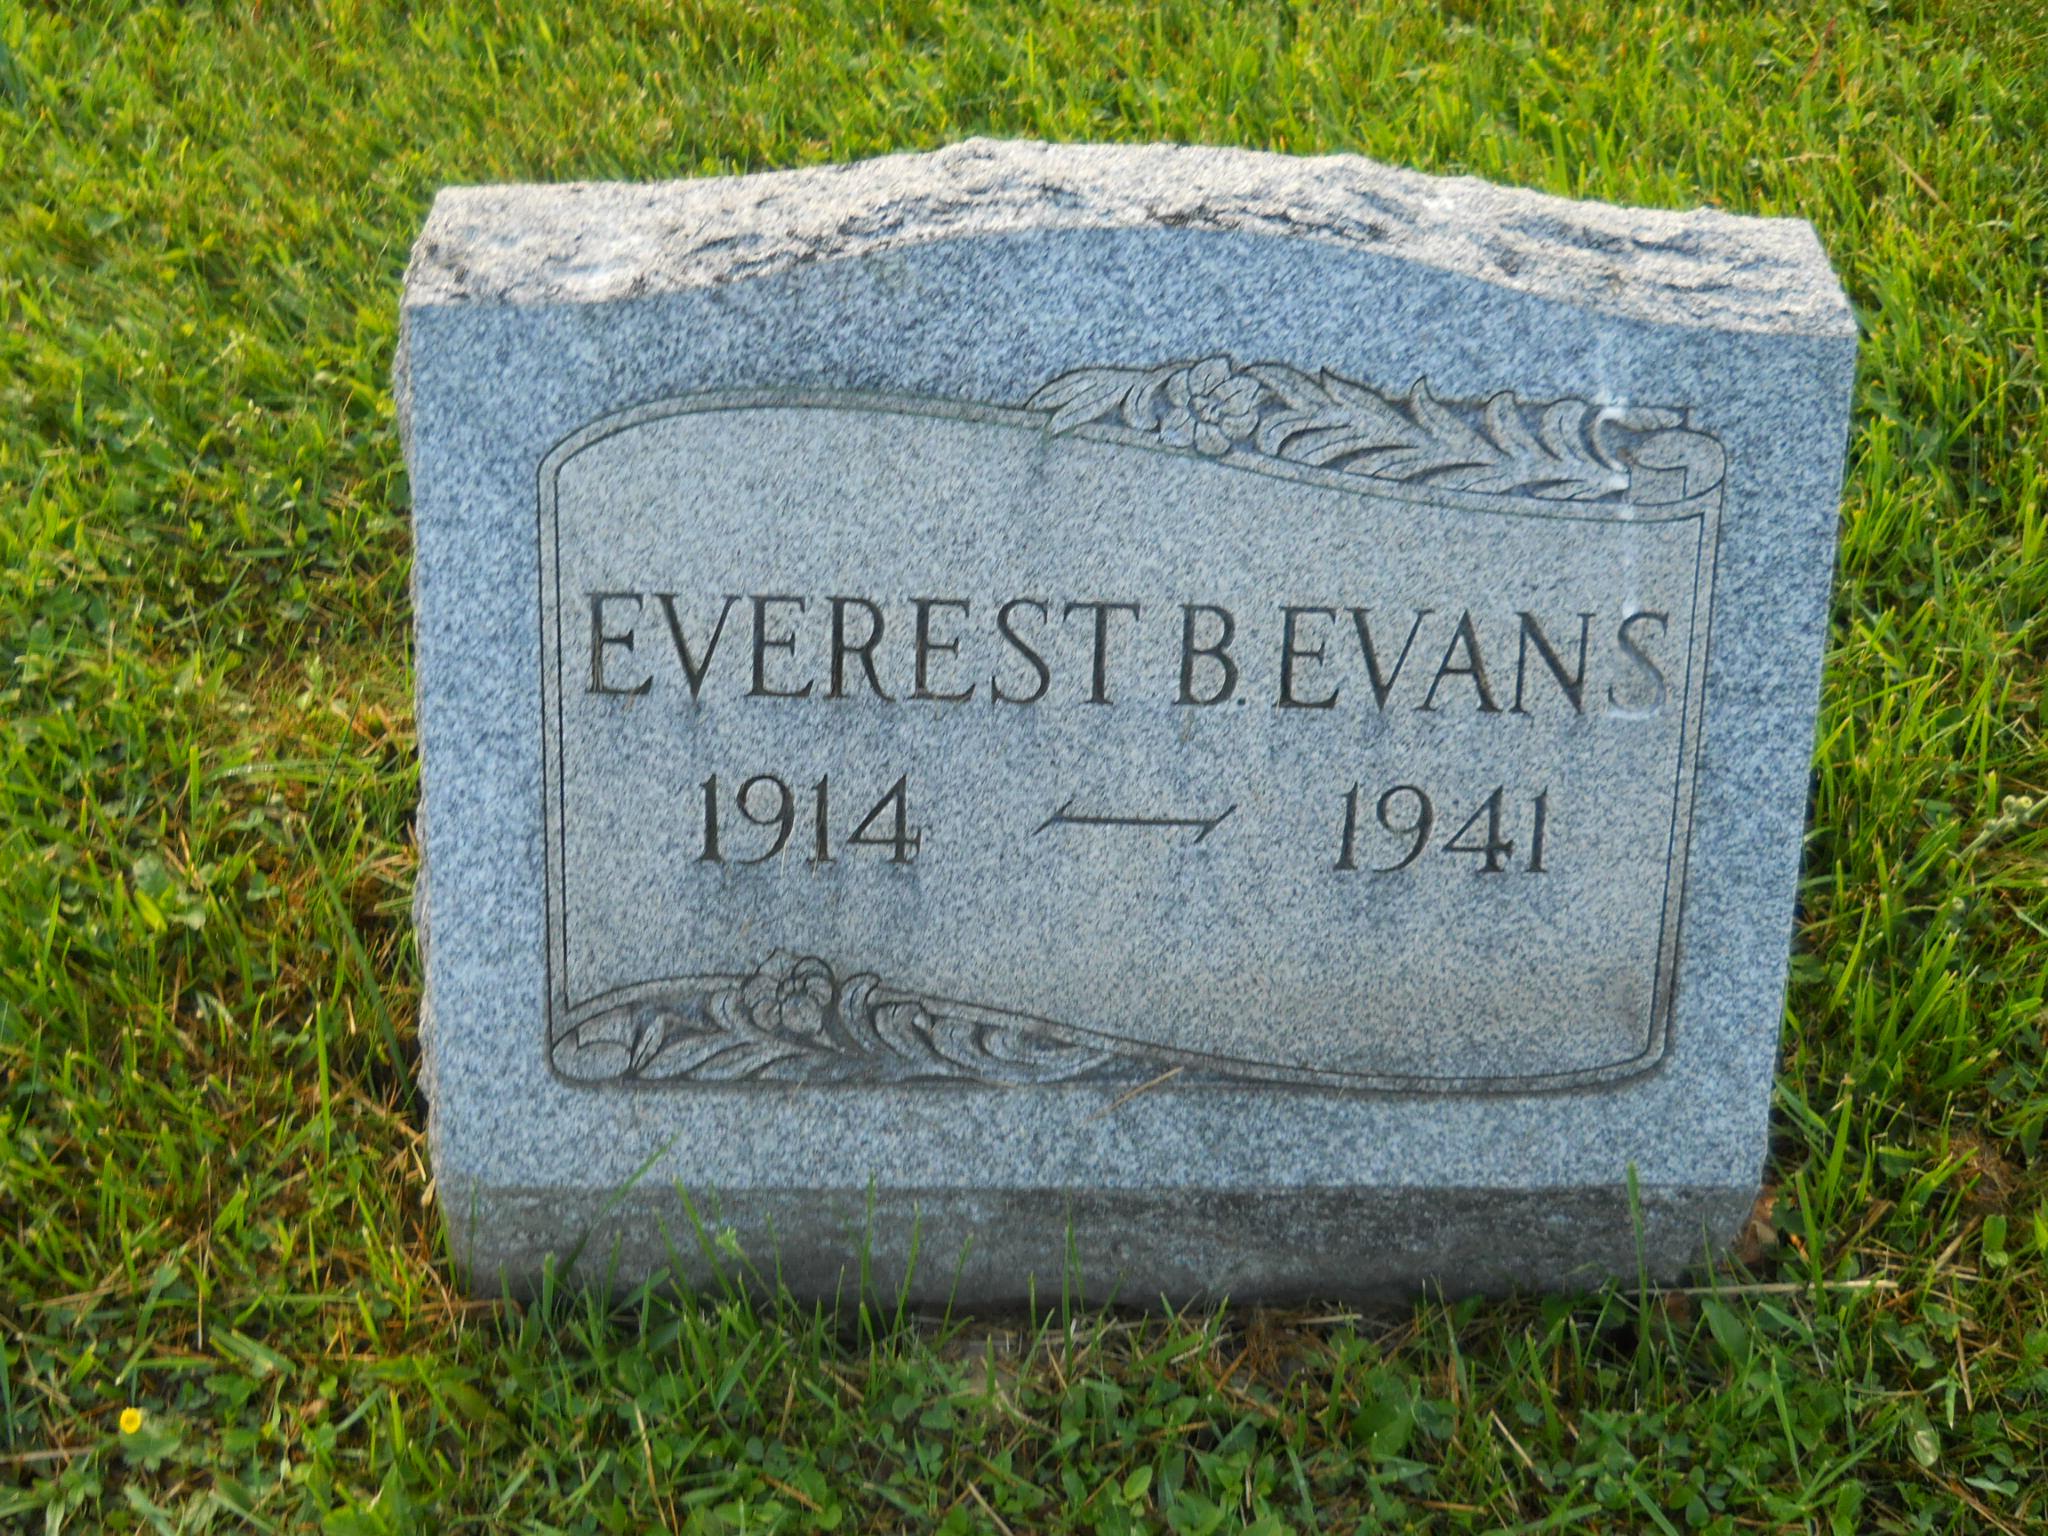 Everest B Evans